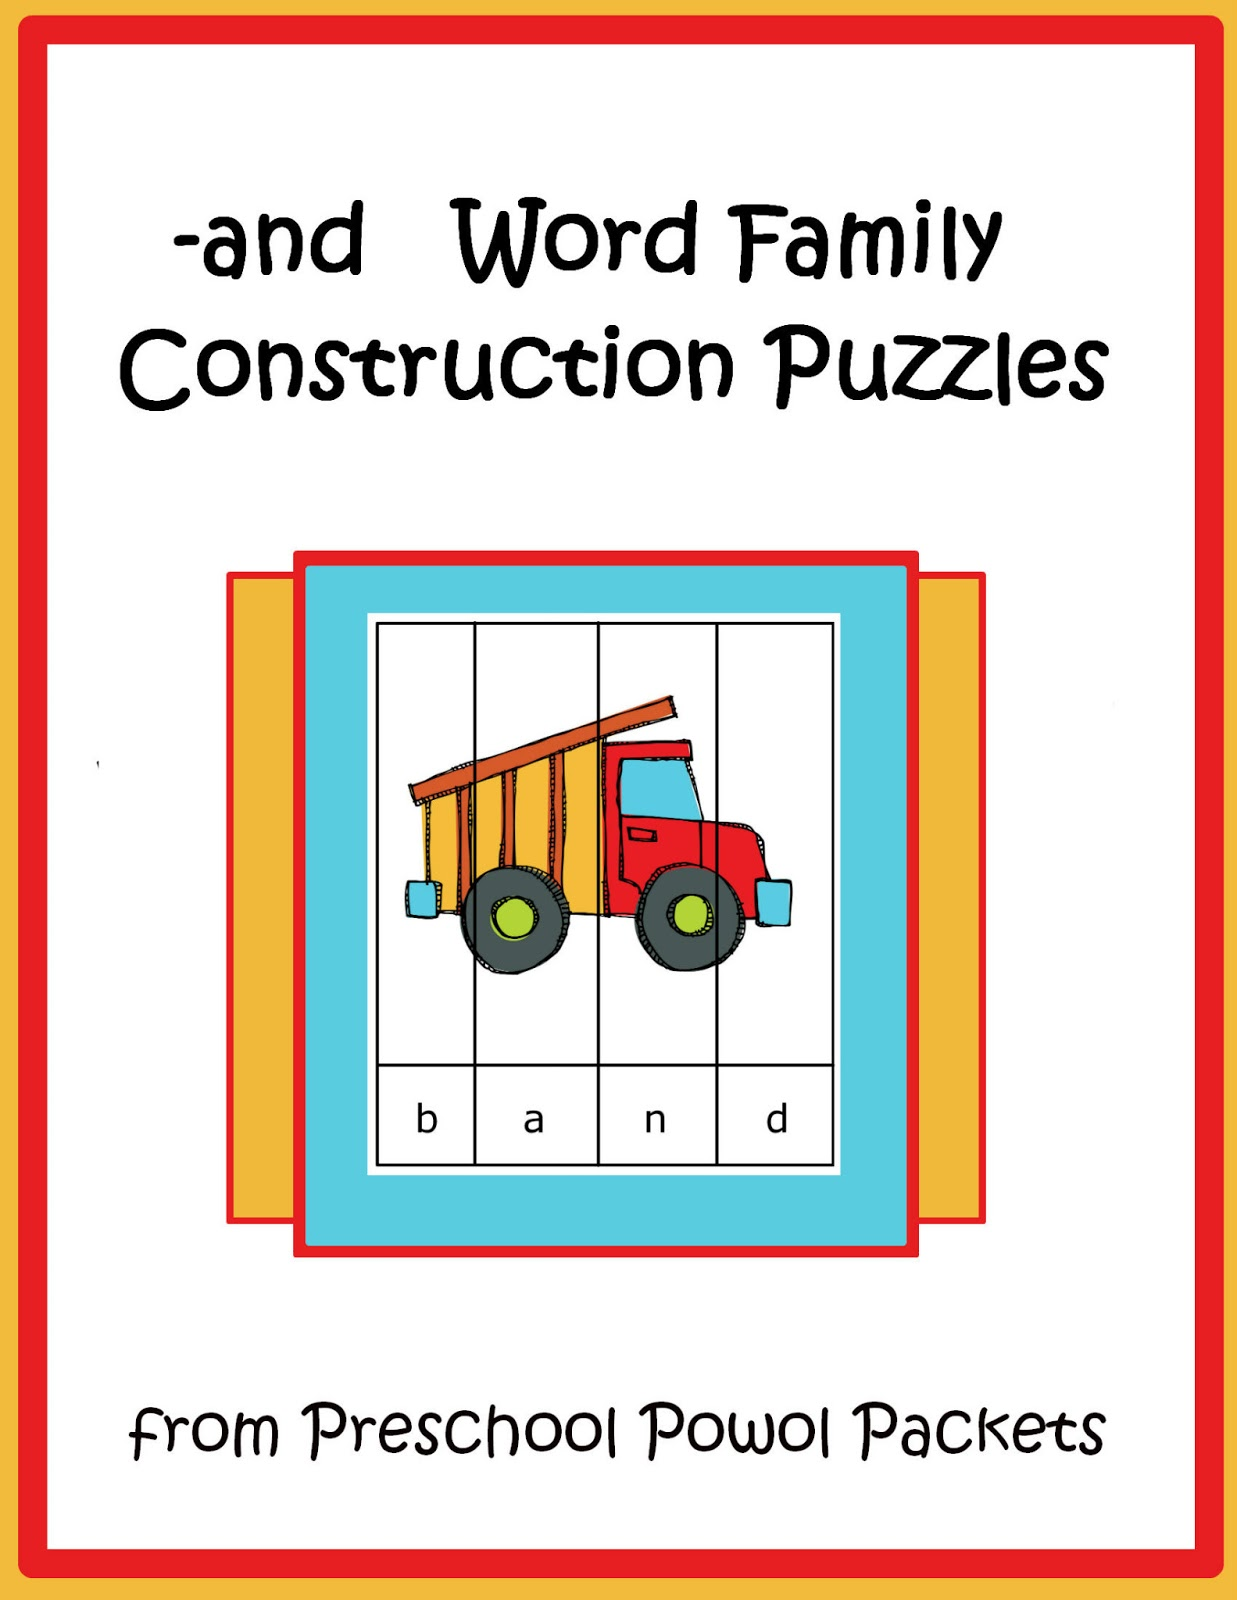 Free Construction Theme Preschool Printables